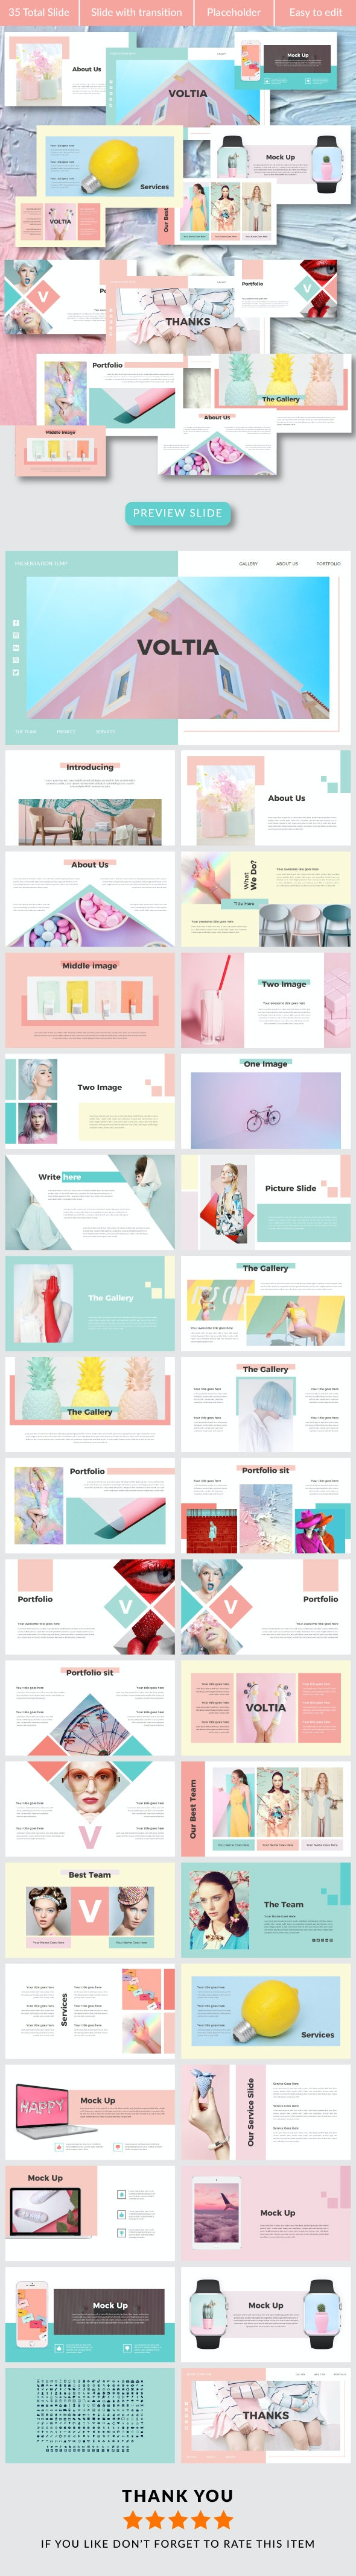 Voltia PowerPoint Temp - Creative PowerPoint Templates